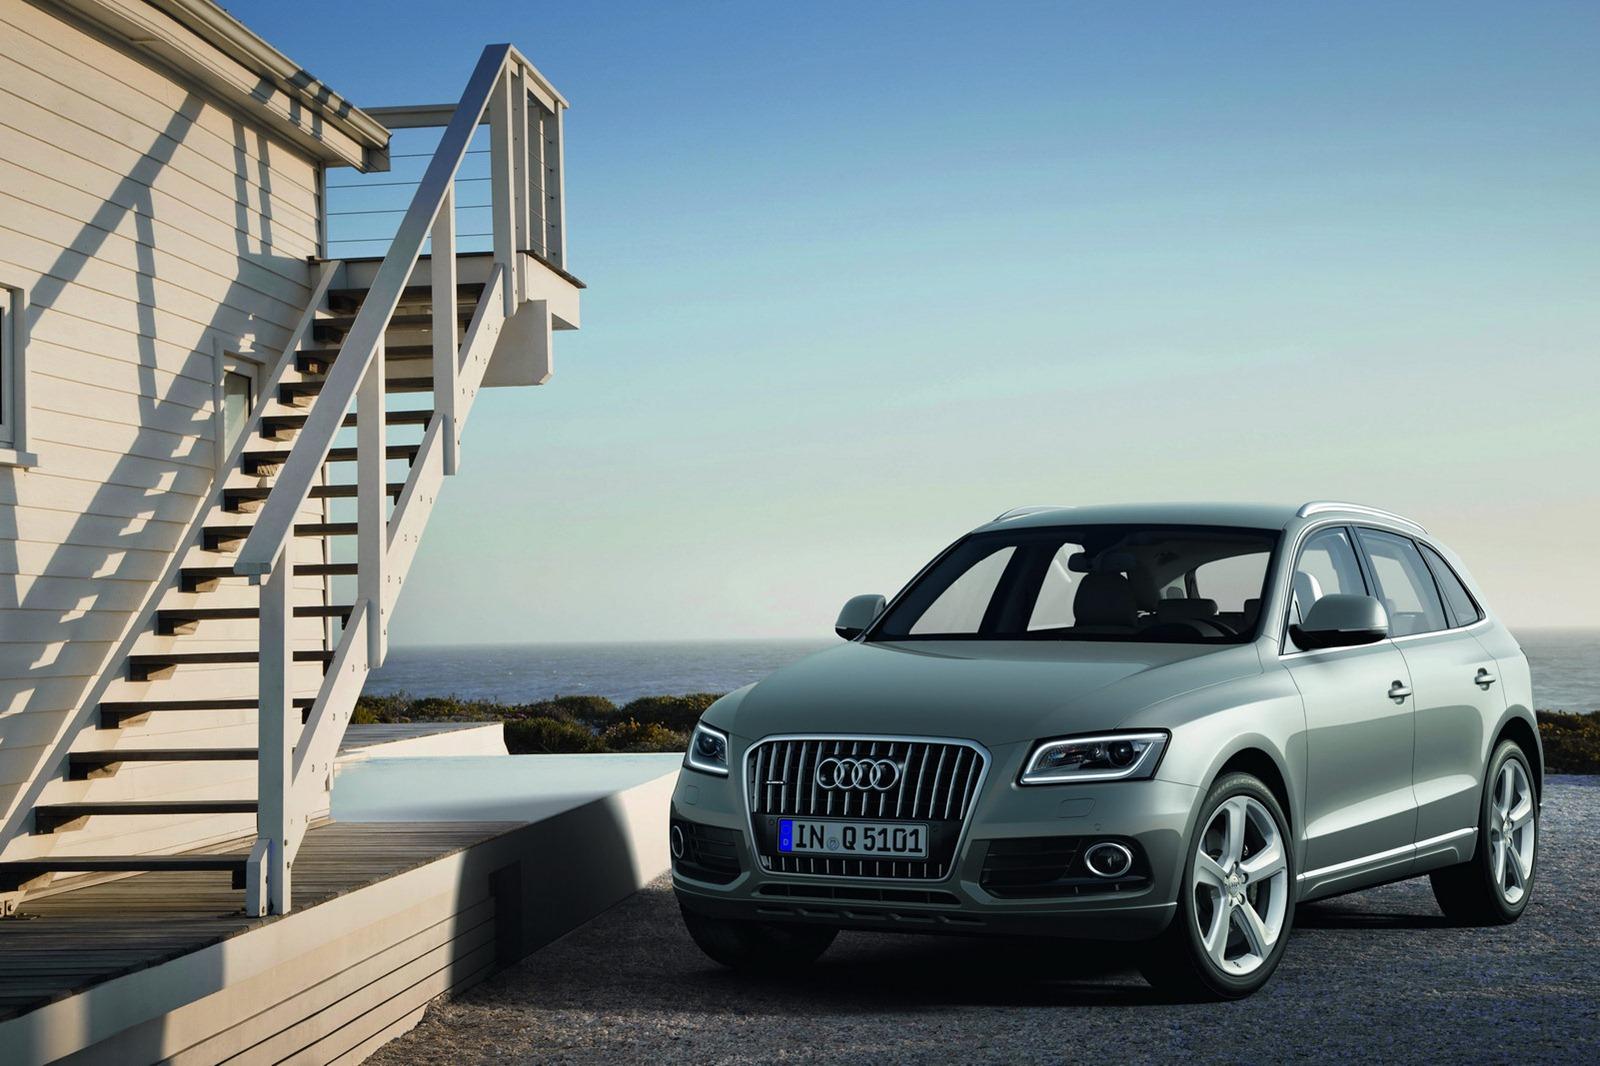 Audi Q5 Facelift 2012 Audi Autopareri